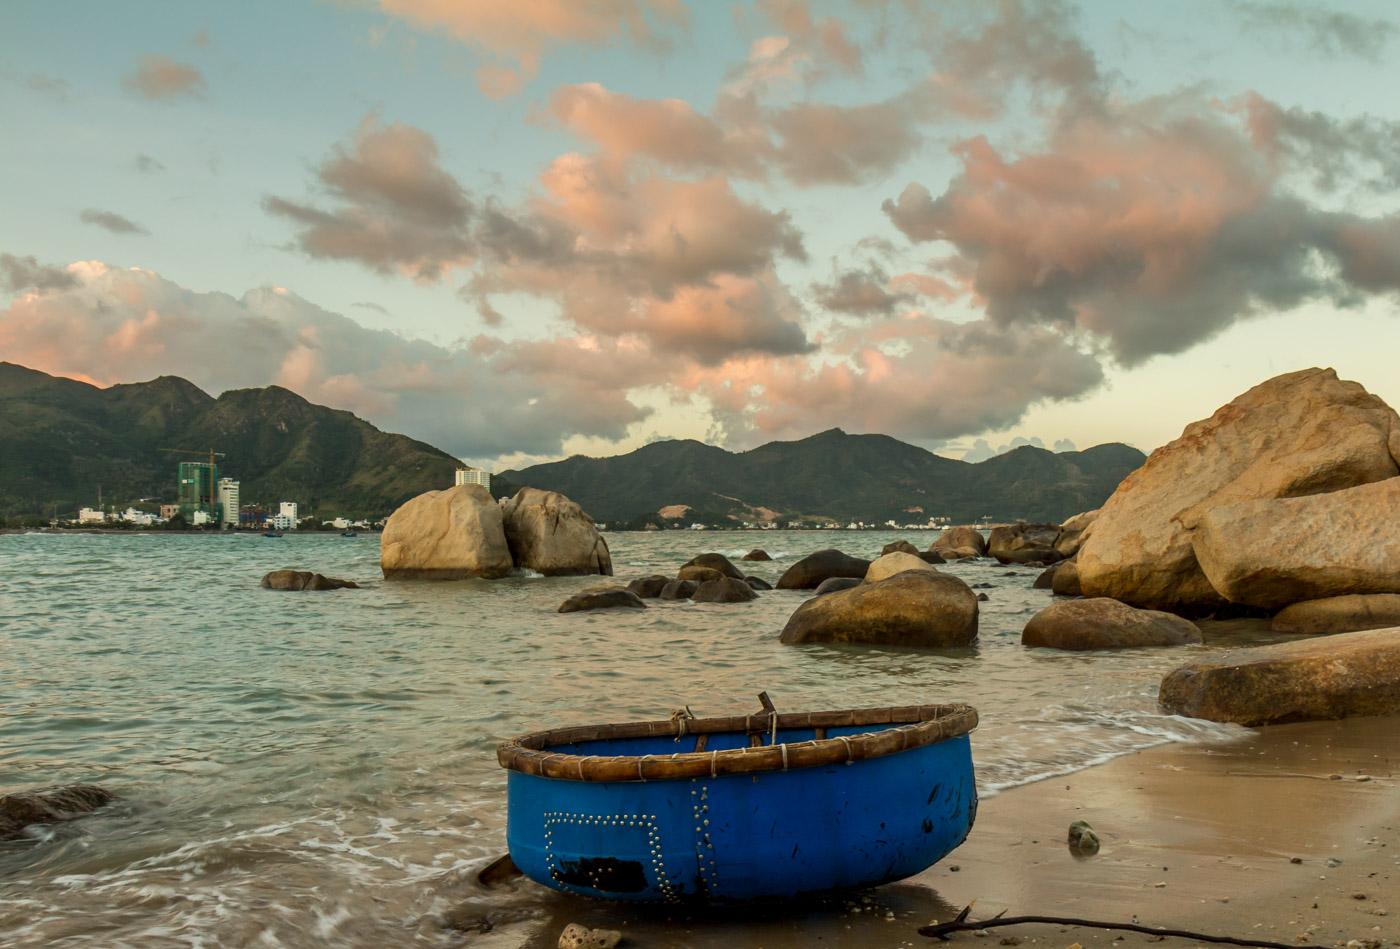 Fishing boat on the rocks.